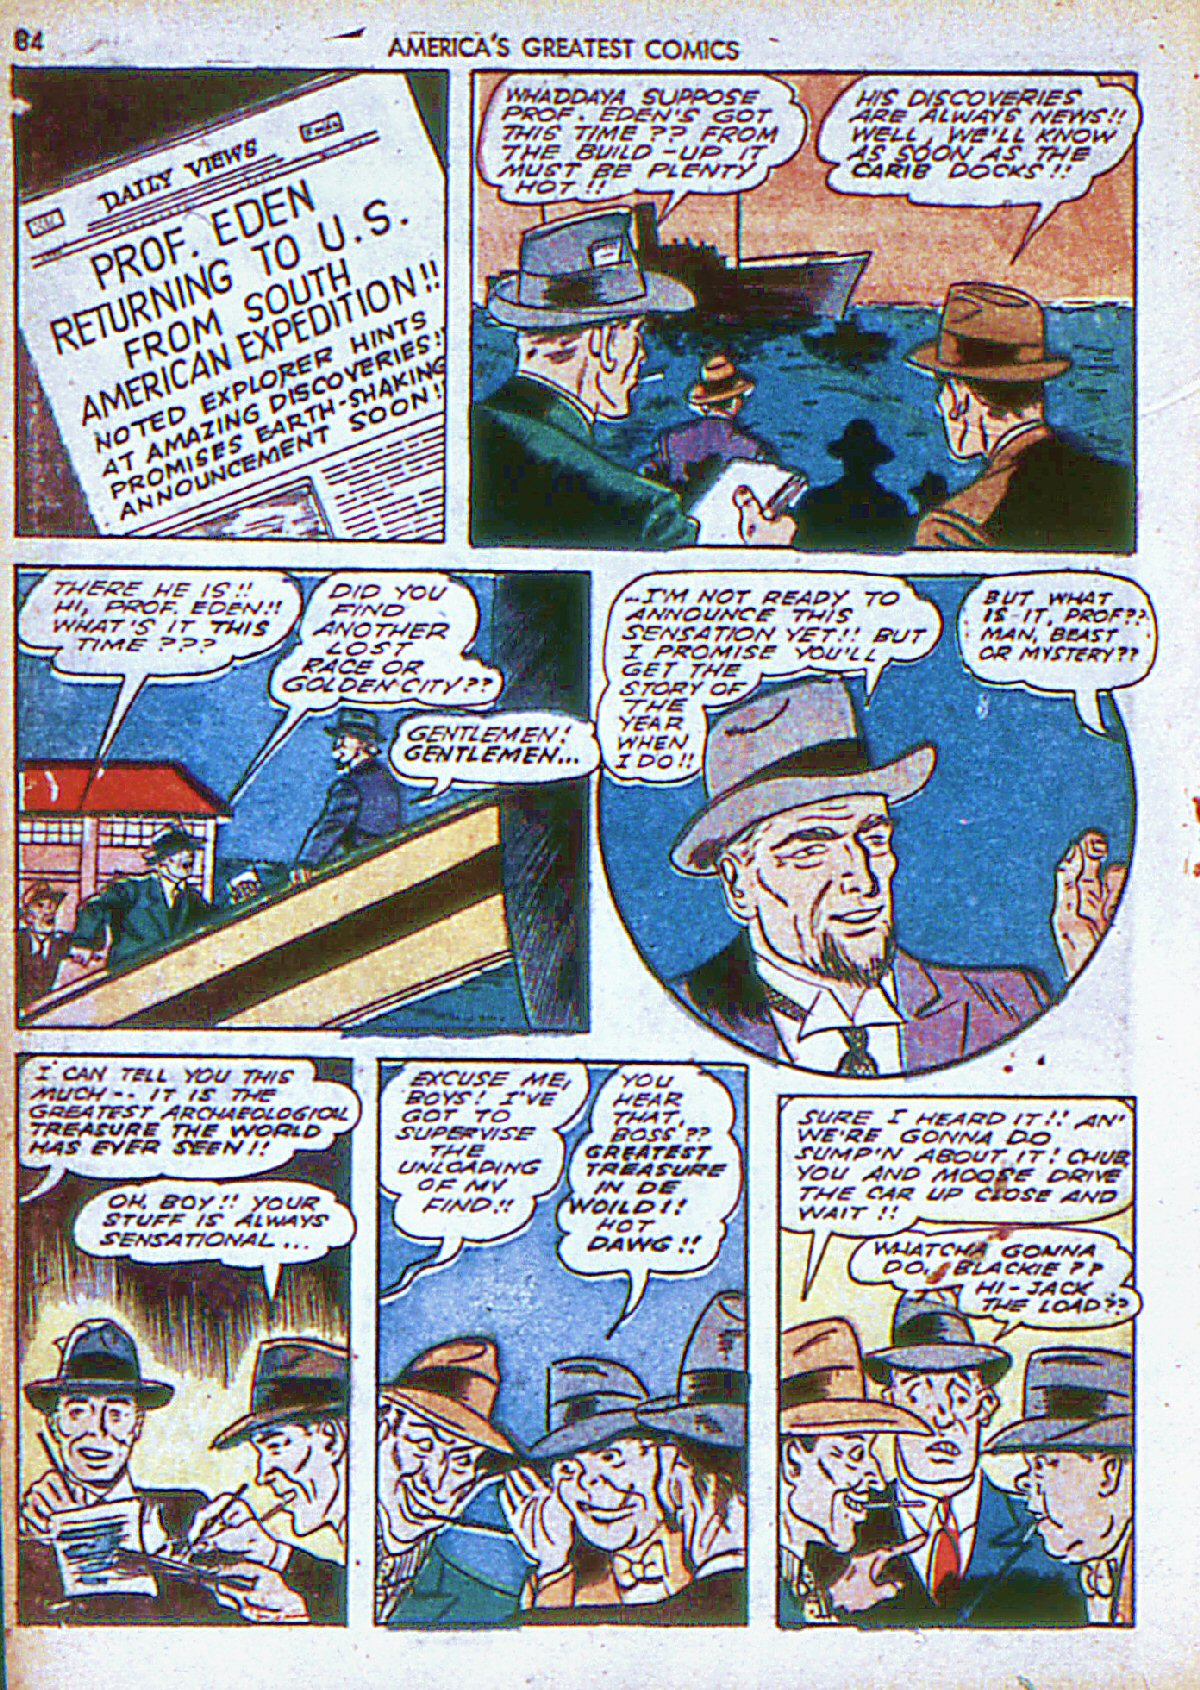 Read online America's Greatest Comics comic -  Issue #6 - 85